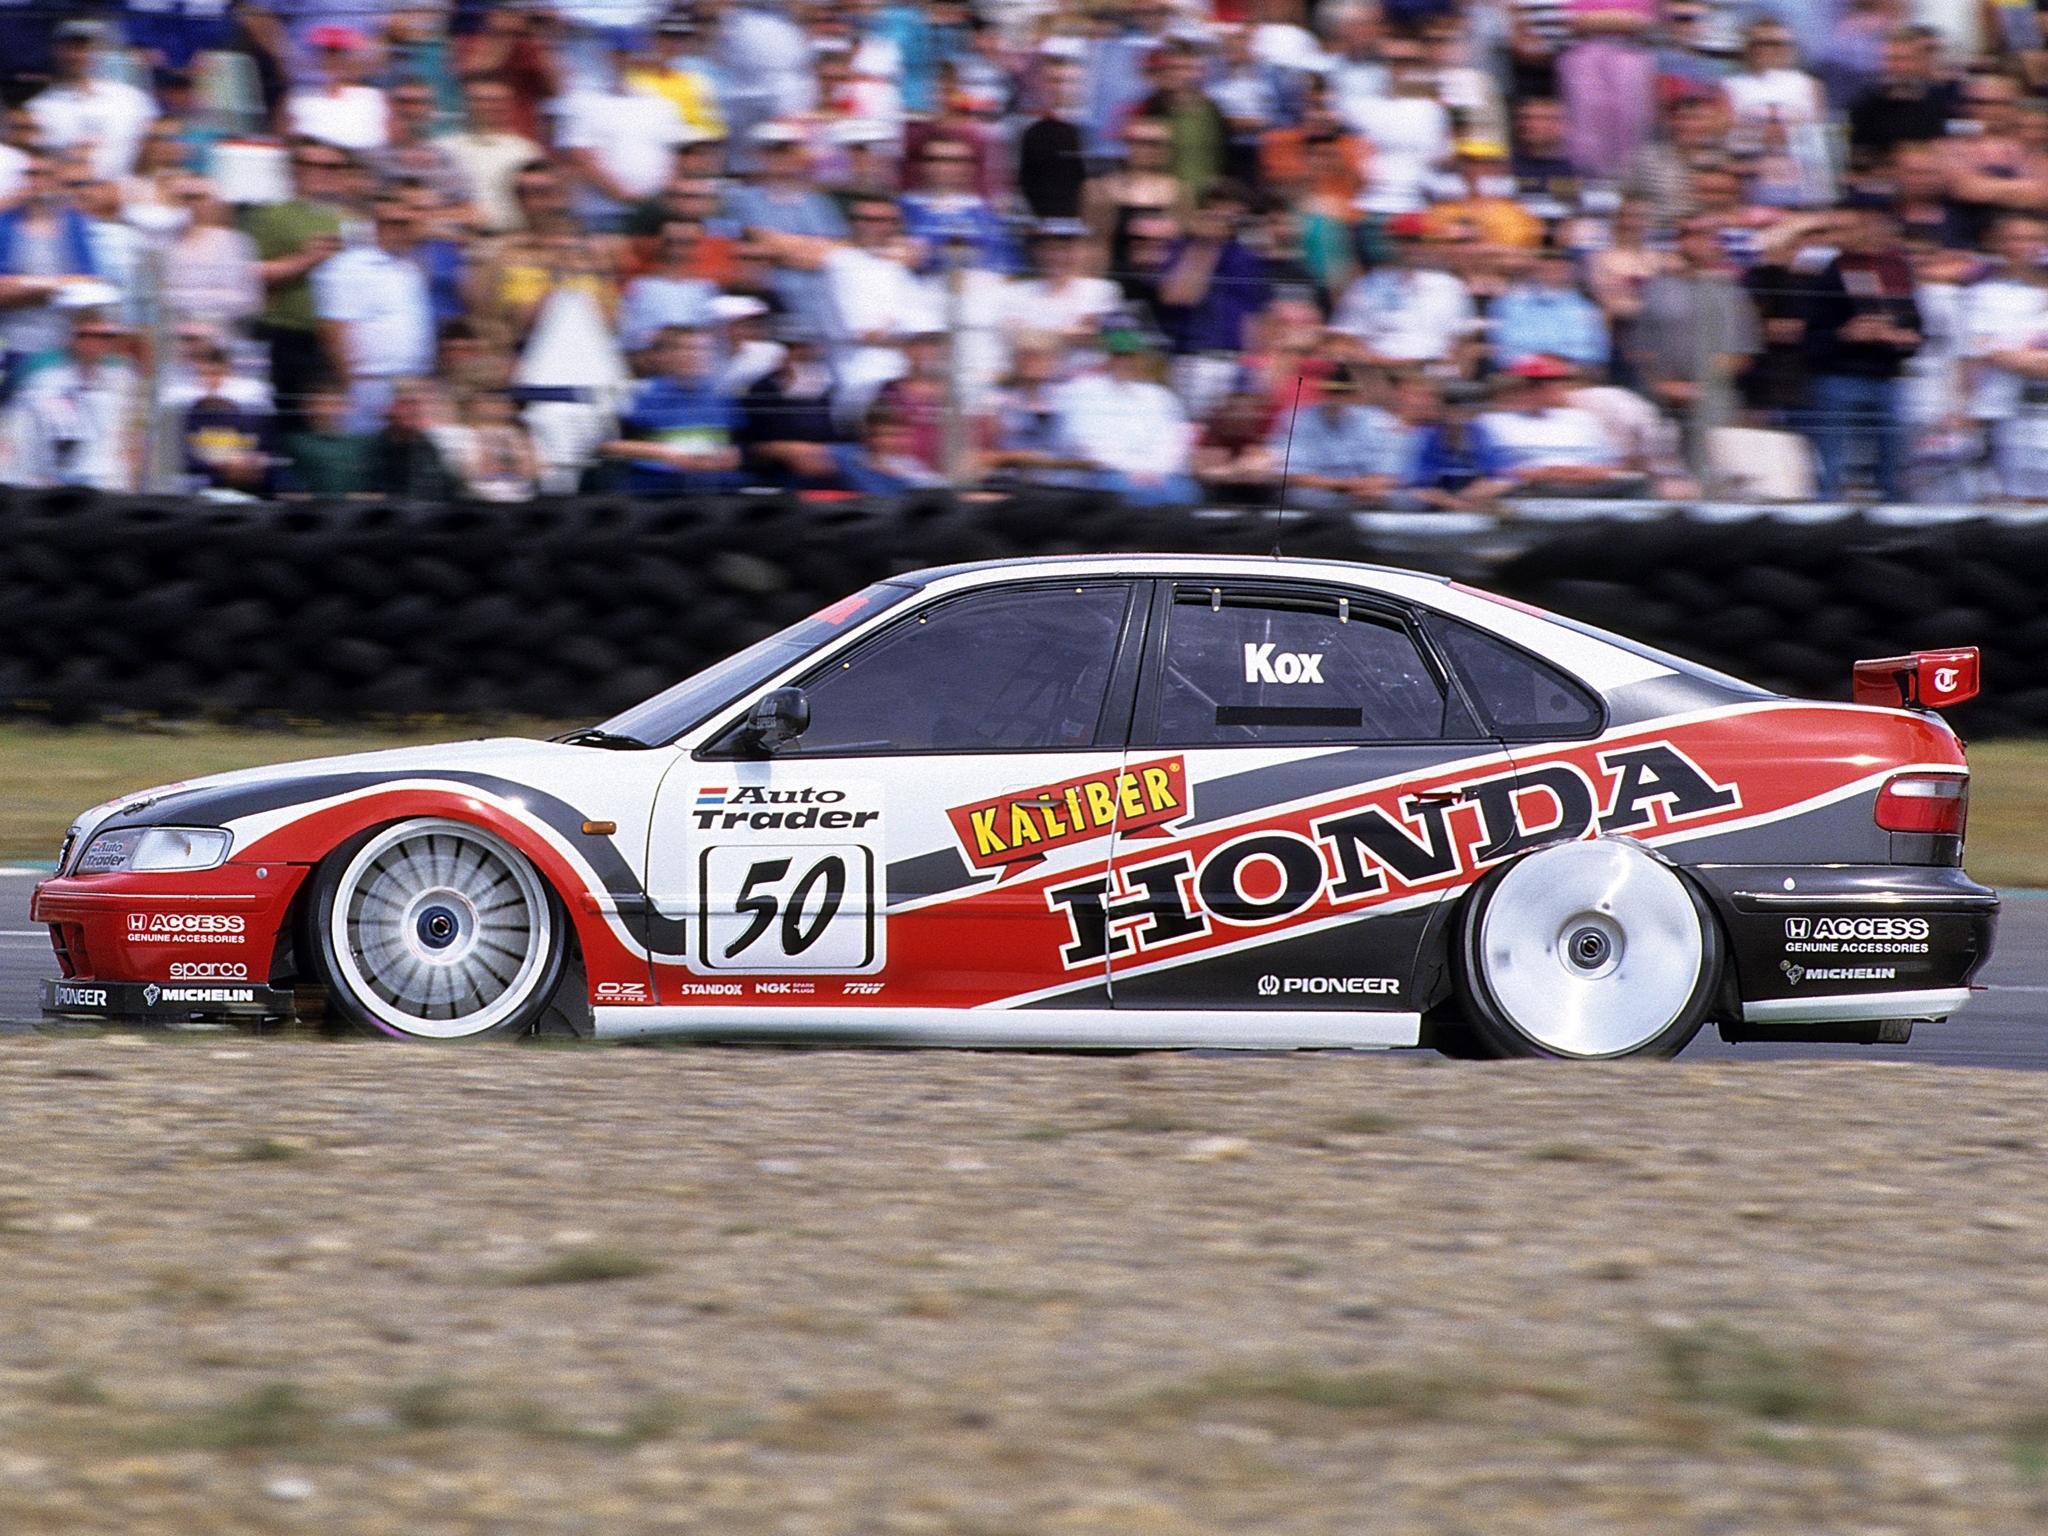 Car Wallpapers 3840x1200 Honda Accord Btcc Cd 1996 98 Hd Wallpaper Background